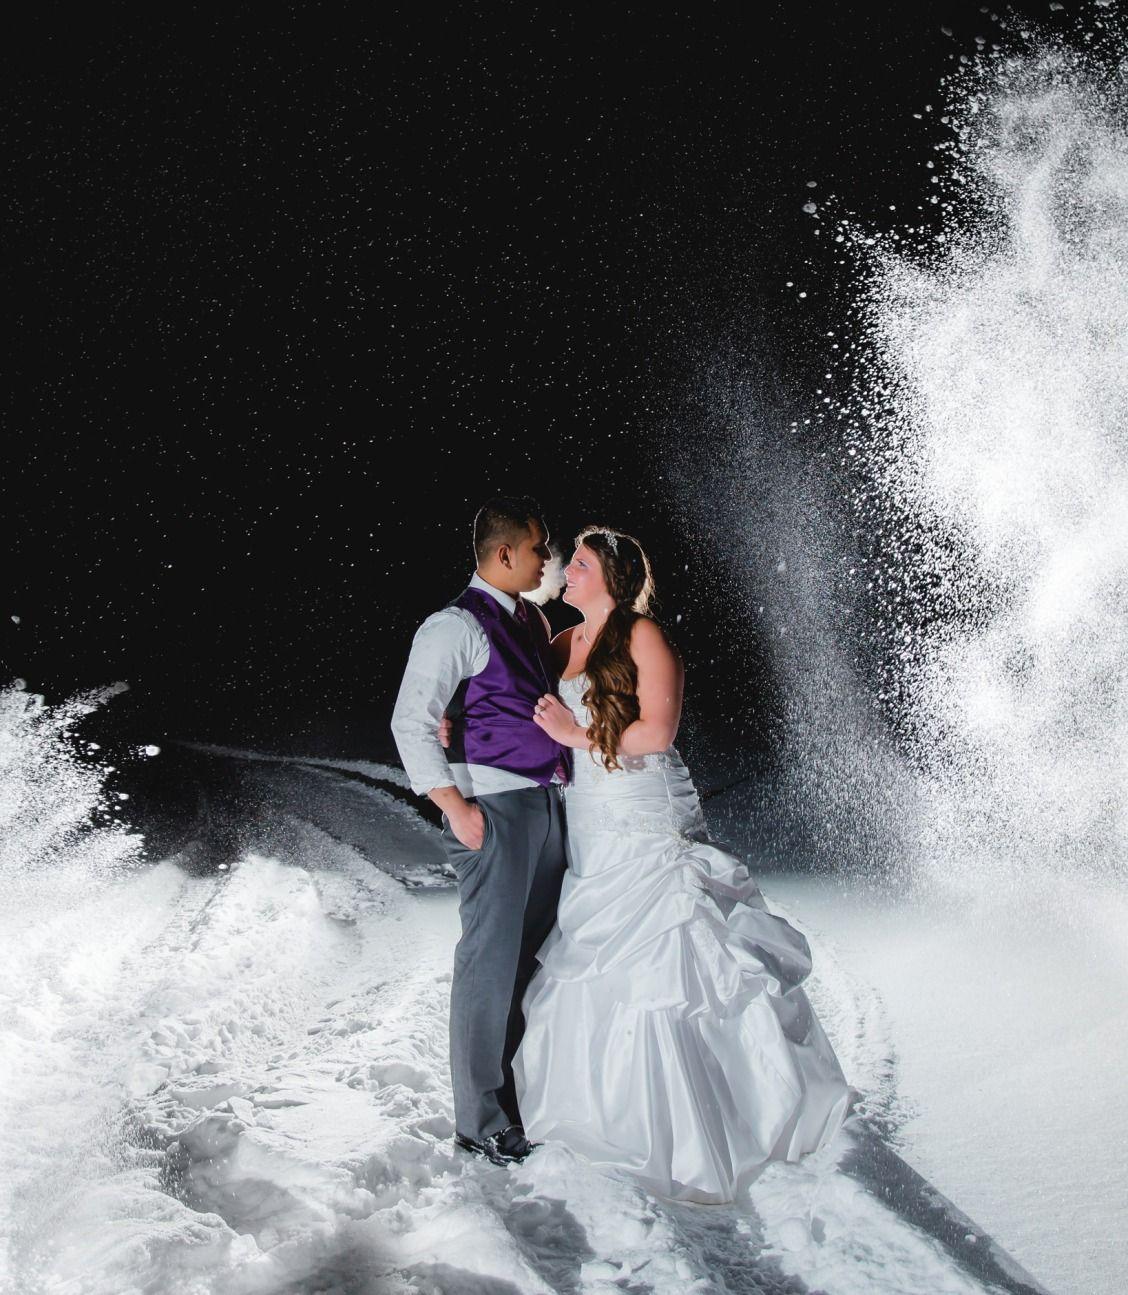 A winter wonderland!   Night wedding photos, Wedding ...